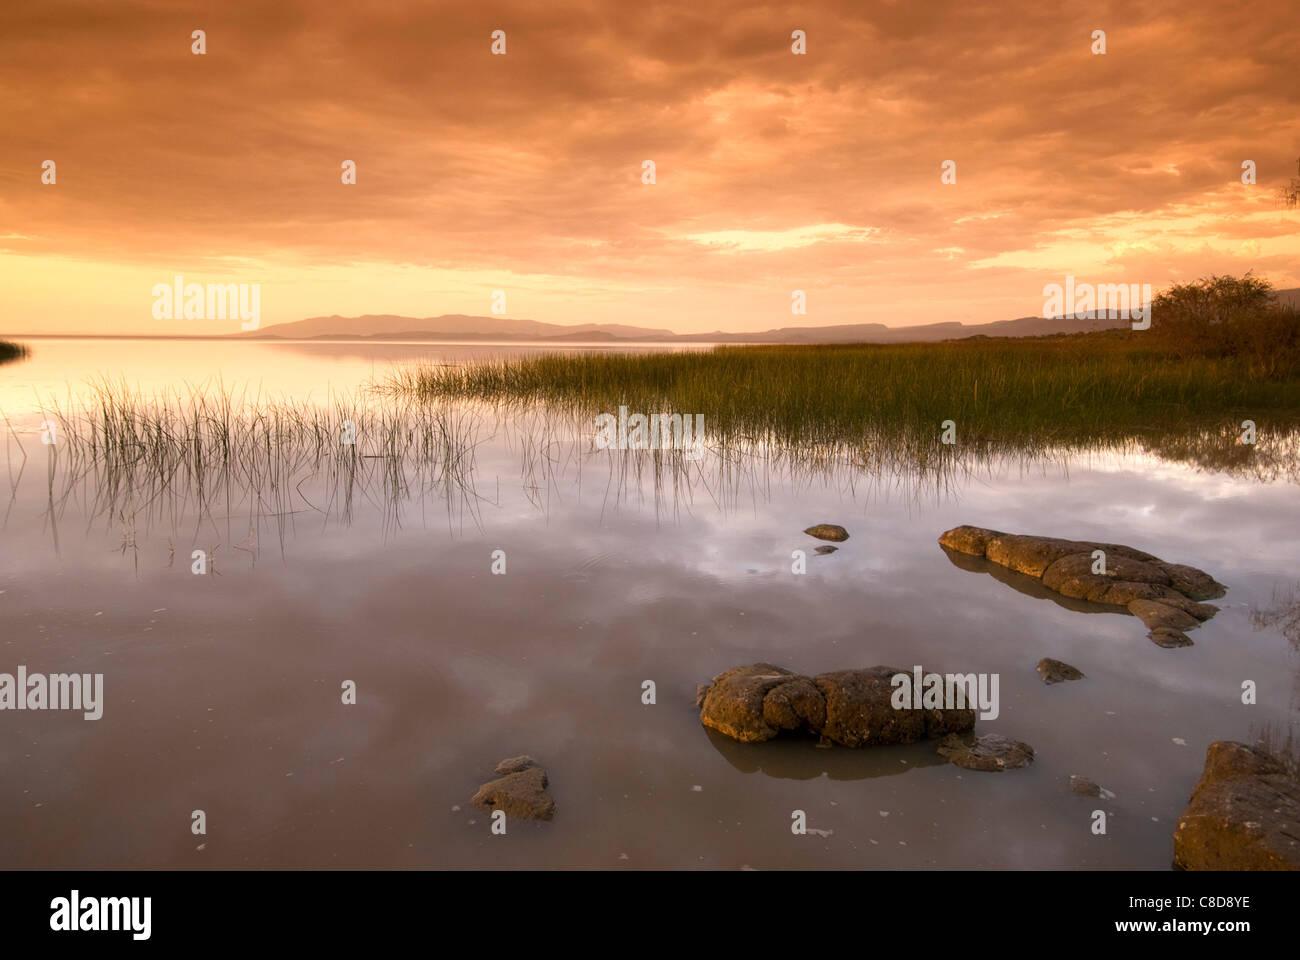 Elk200-5067 Ethiopia, Lake Langano, sunset - Stock Image